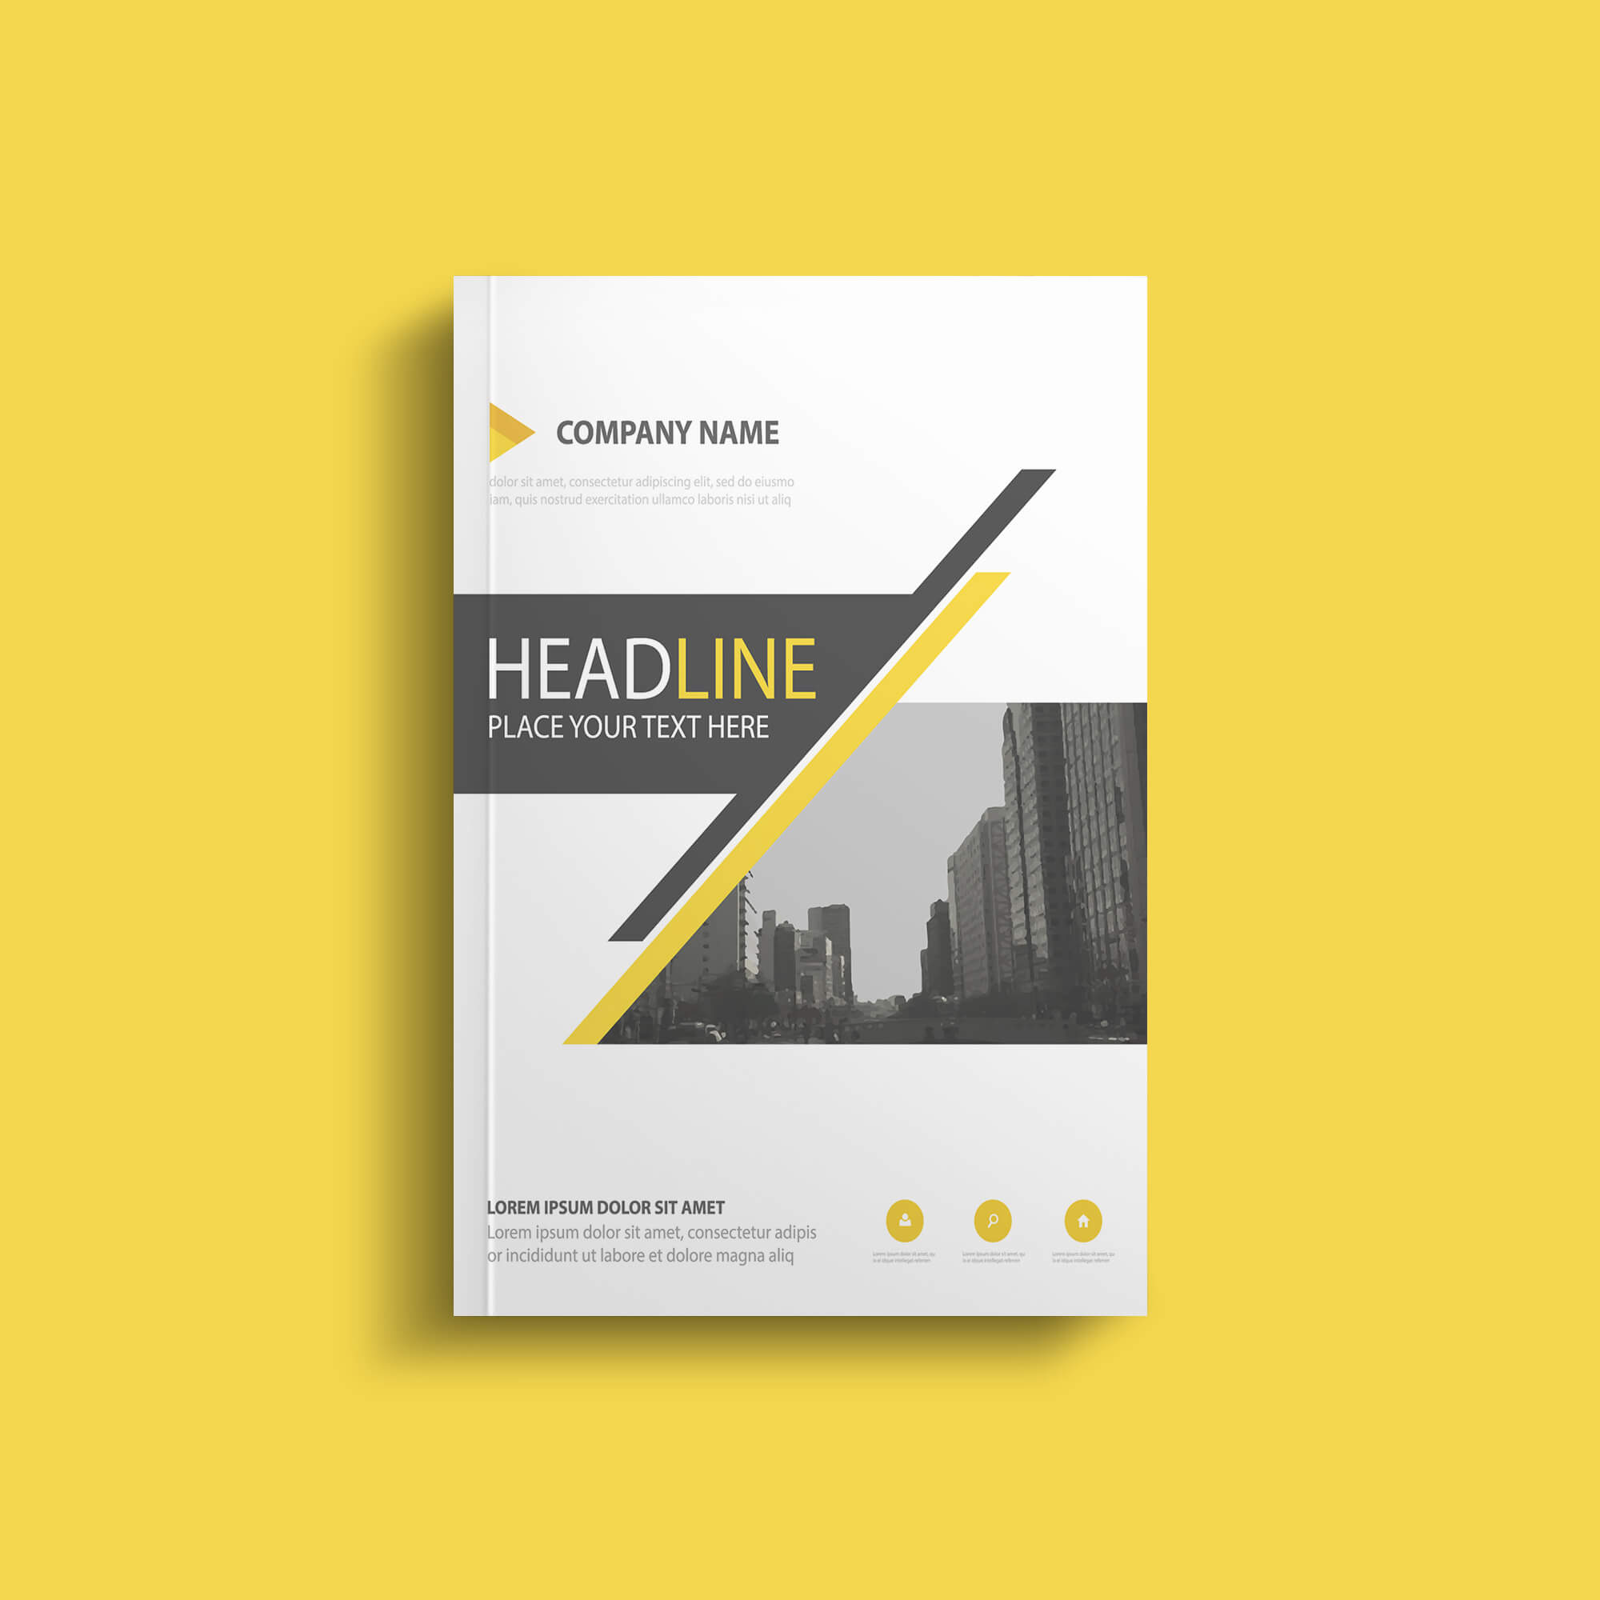 Design Free Paperback Book Mockup PSD Template